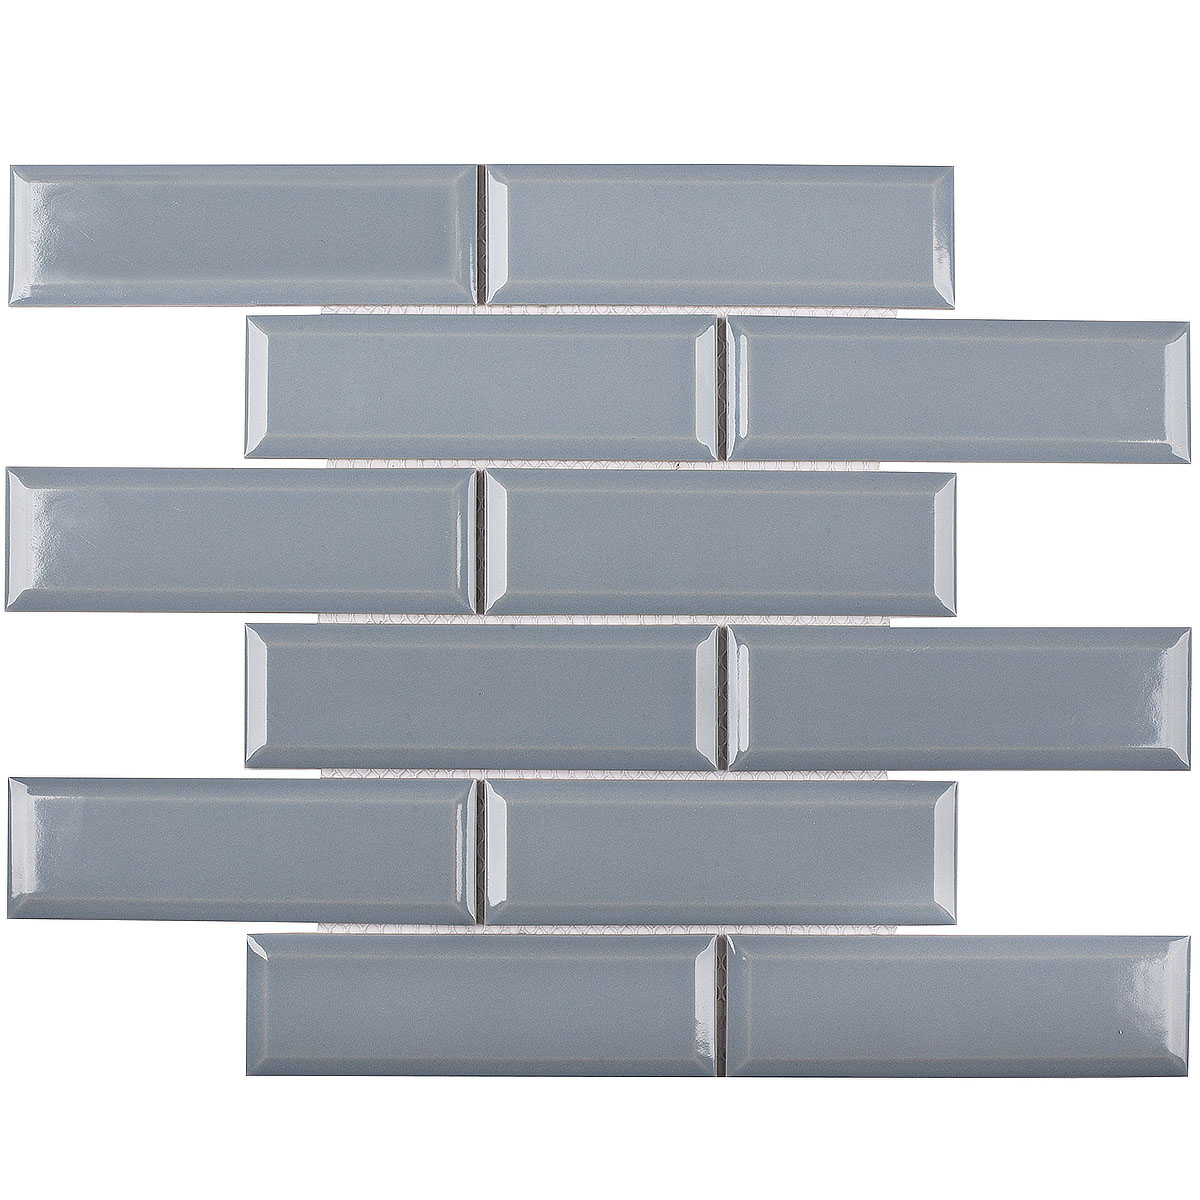 Керамическая мозаика Metro Bluish-Grey Glossy 45х145 (KM41843) на сетке 287х295х6,5 см из коллекции Brick & Metro.